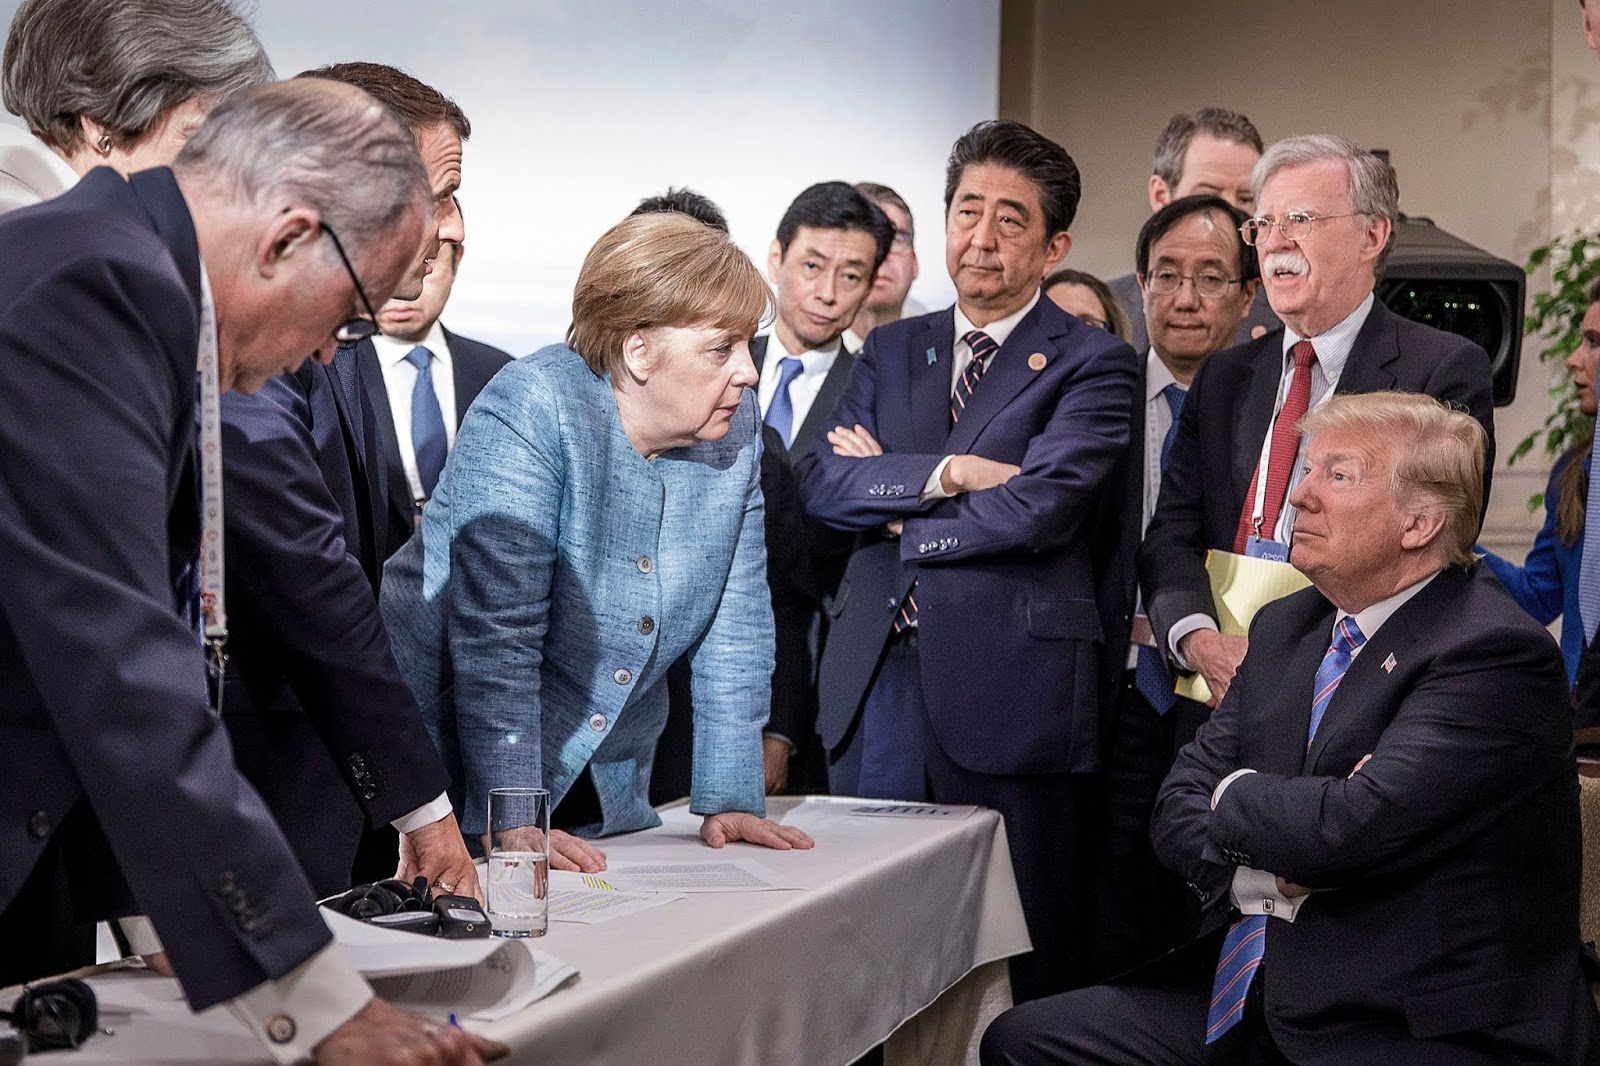 Donald Trump Deserves A Nobel Peace Price Should The Deal Work